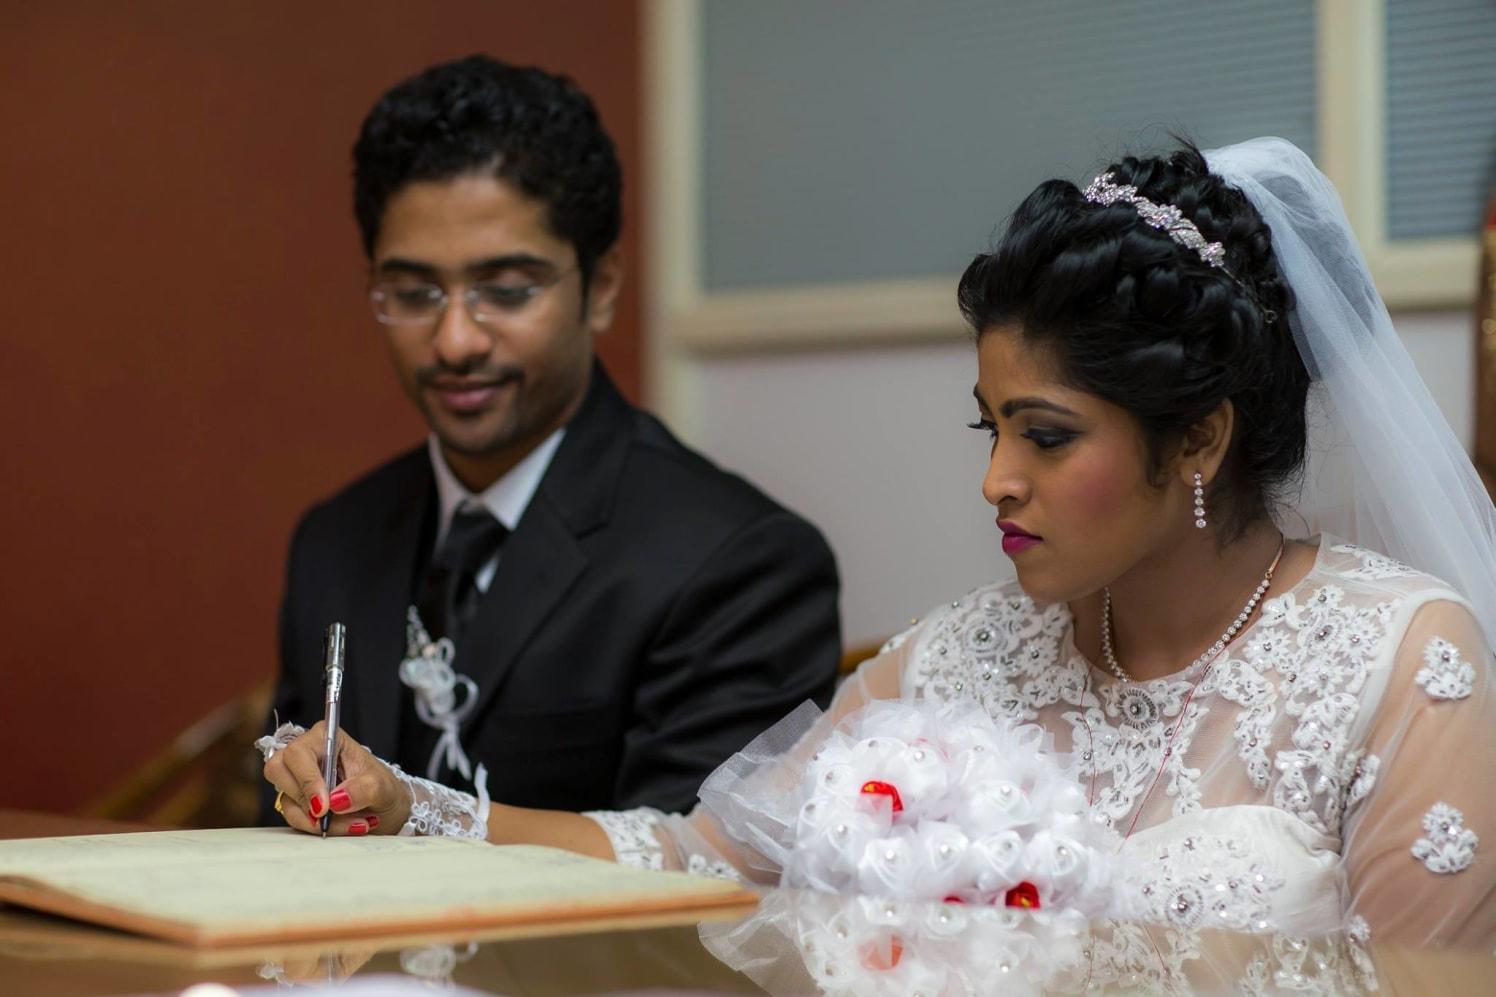 Christian Weddings Special Traditions by Lloyd Bangera Wedding-photography | Weddings Photos & Ideas